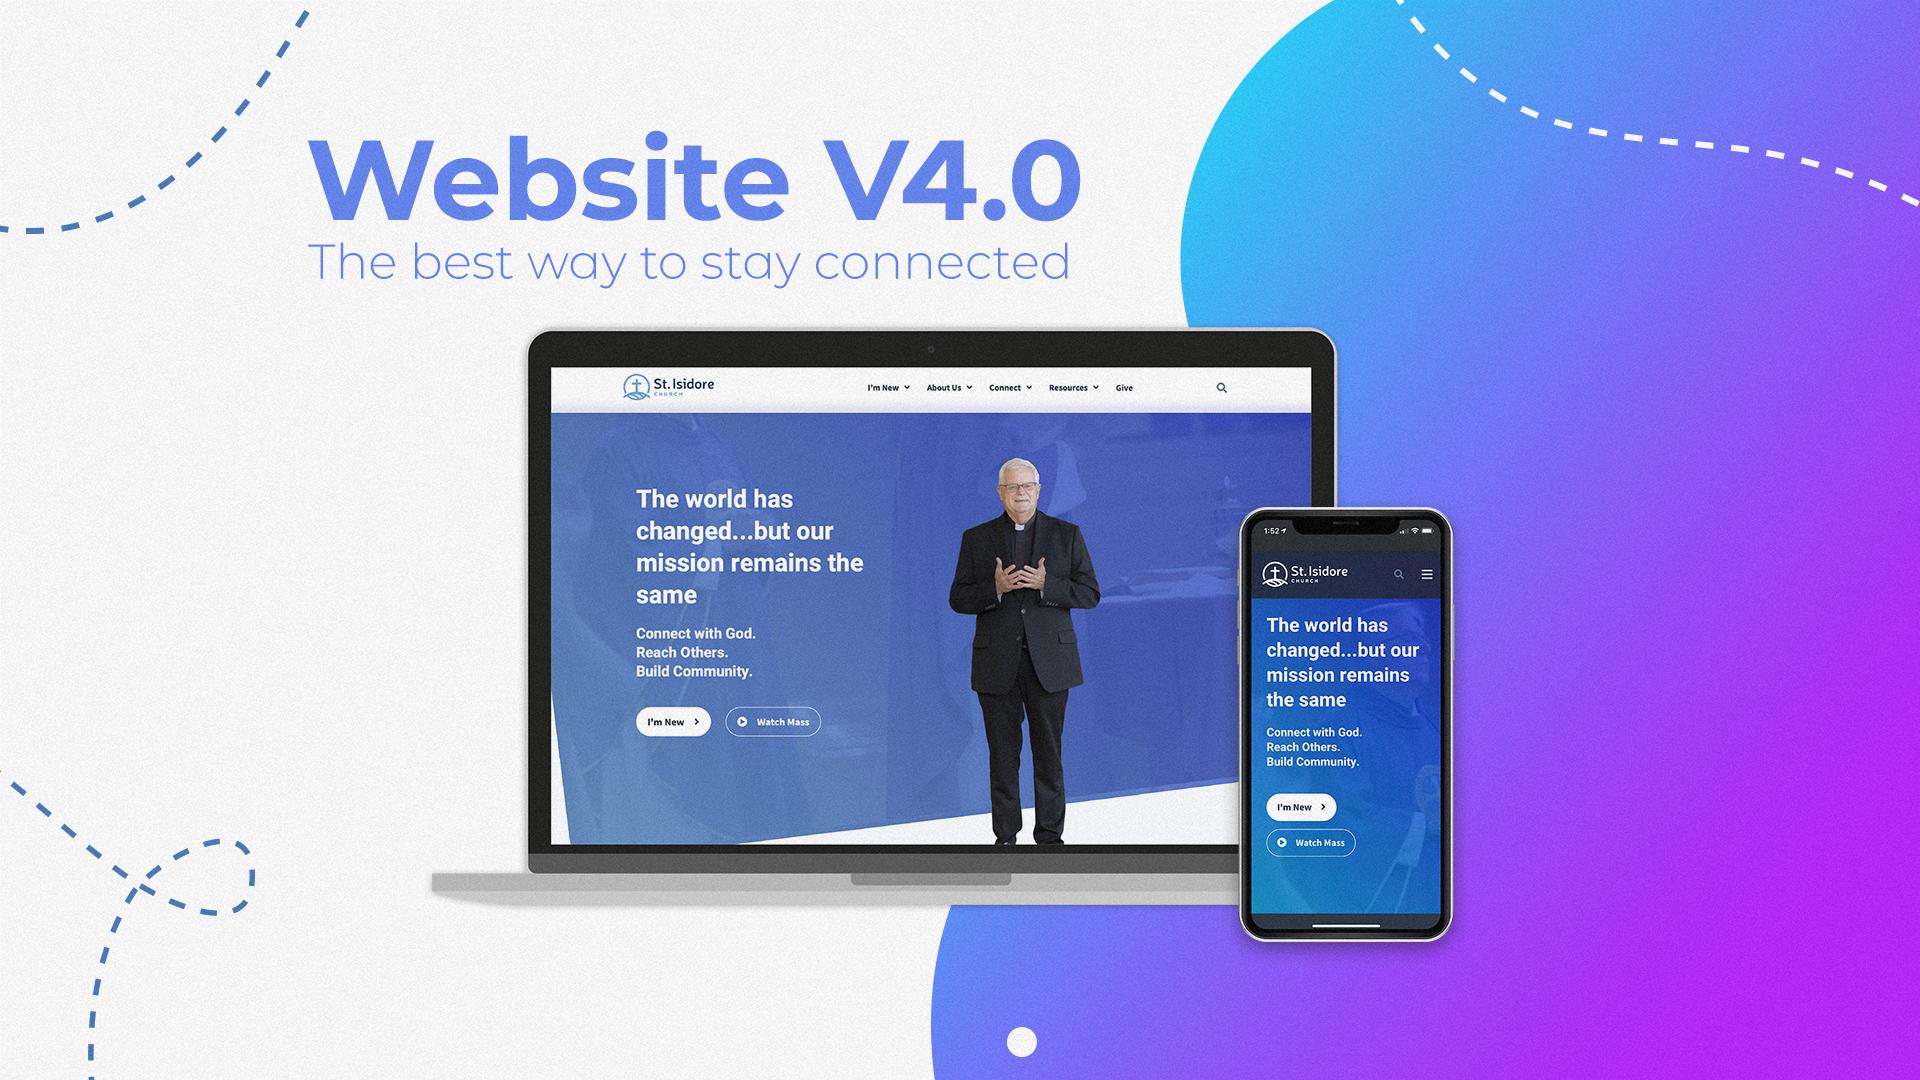 Website Version 4.0